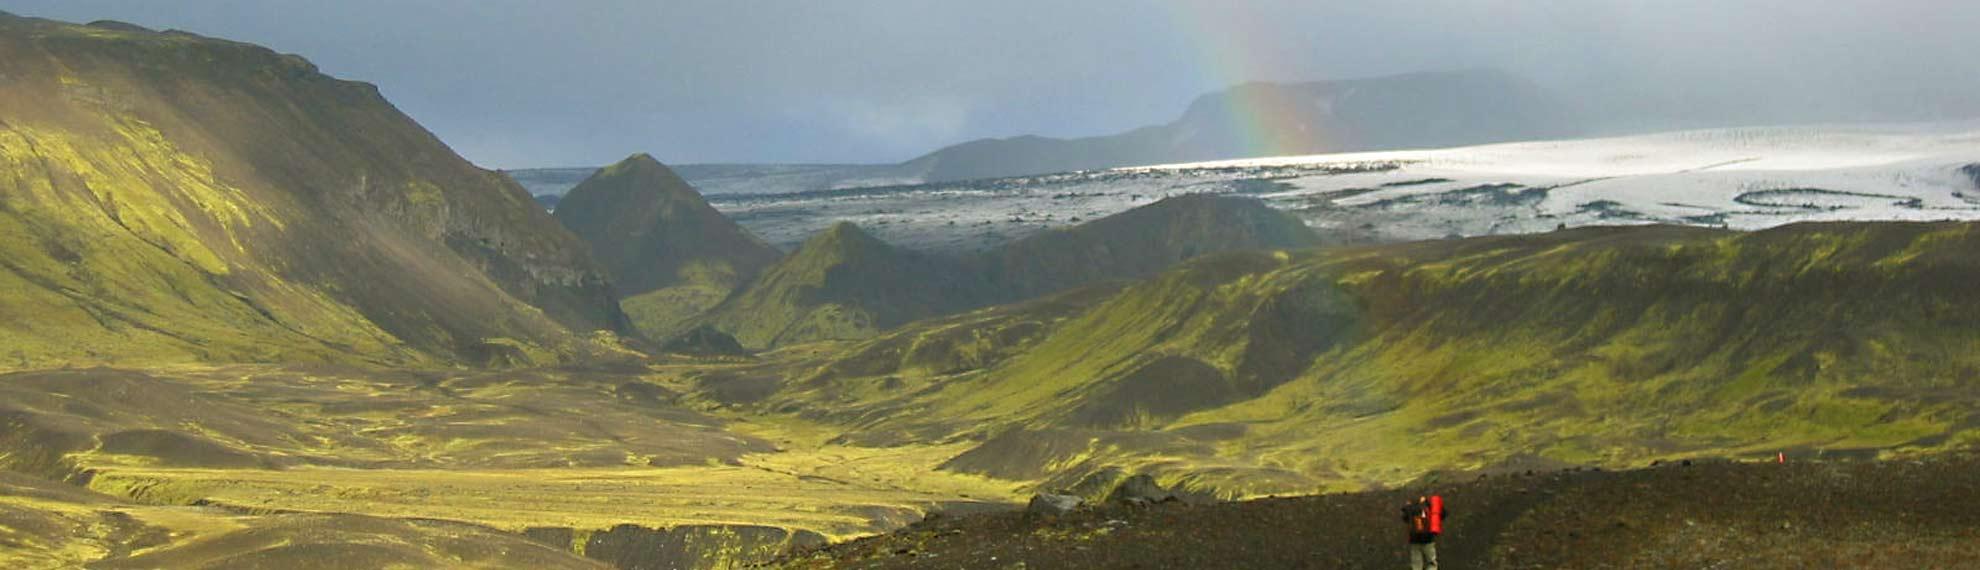 Hiking islandia